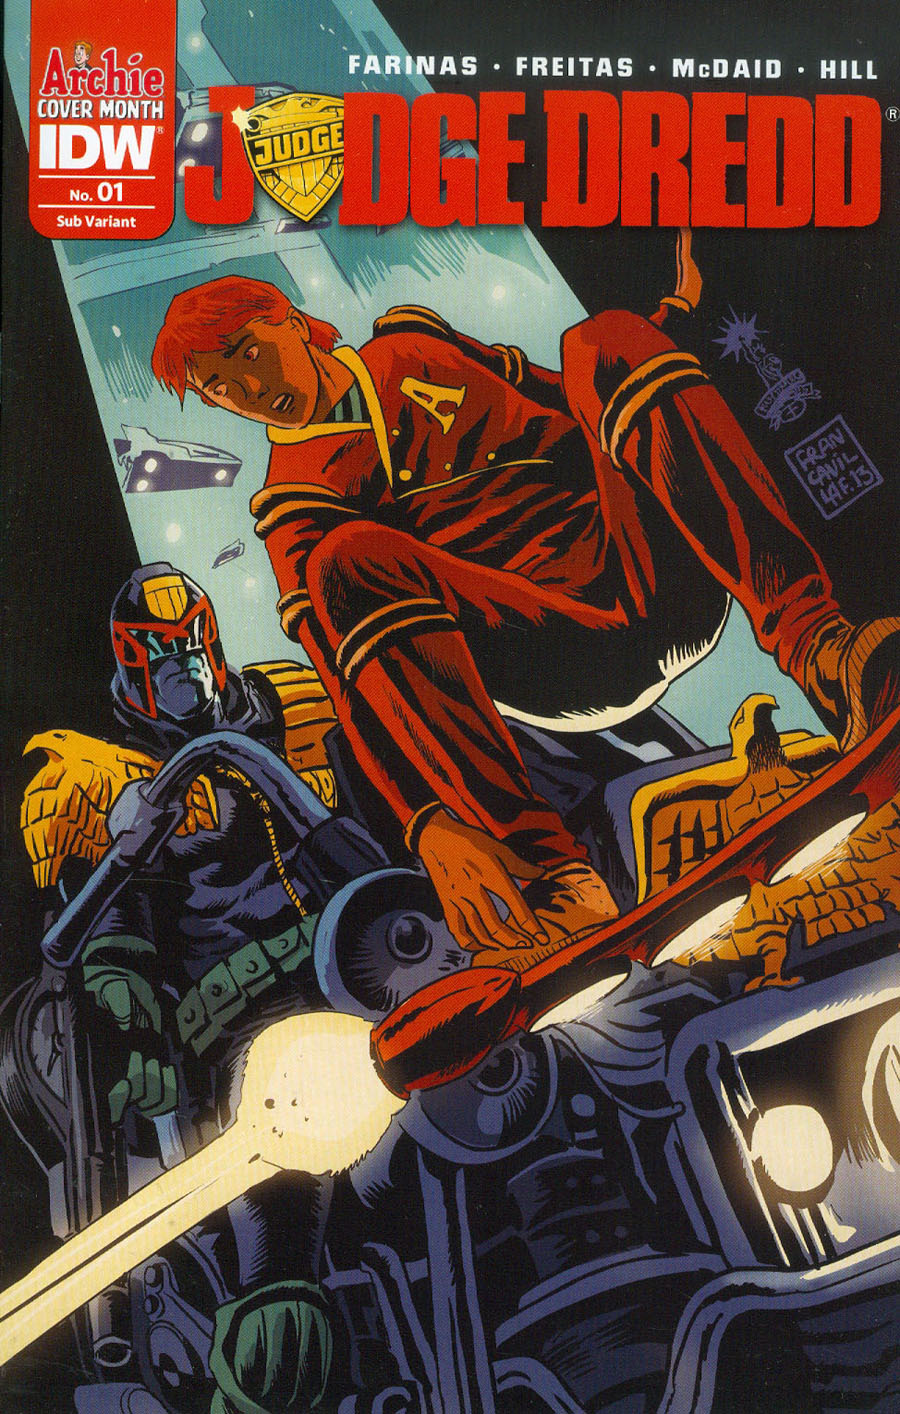 Judge Dredd Vol 5 #1 Cover B Variant Francesco Francavilla Archie 75th Anniversary Subscription Cover